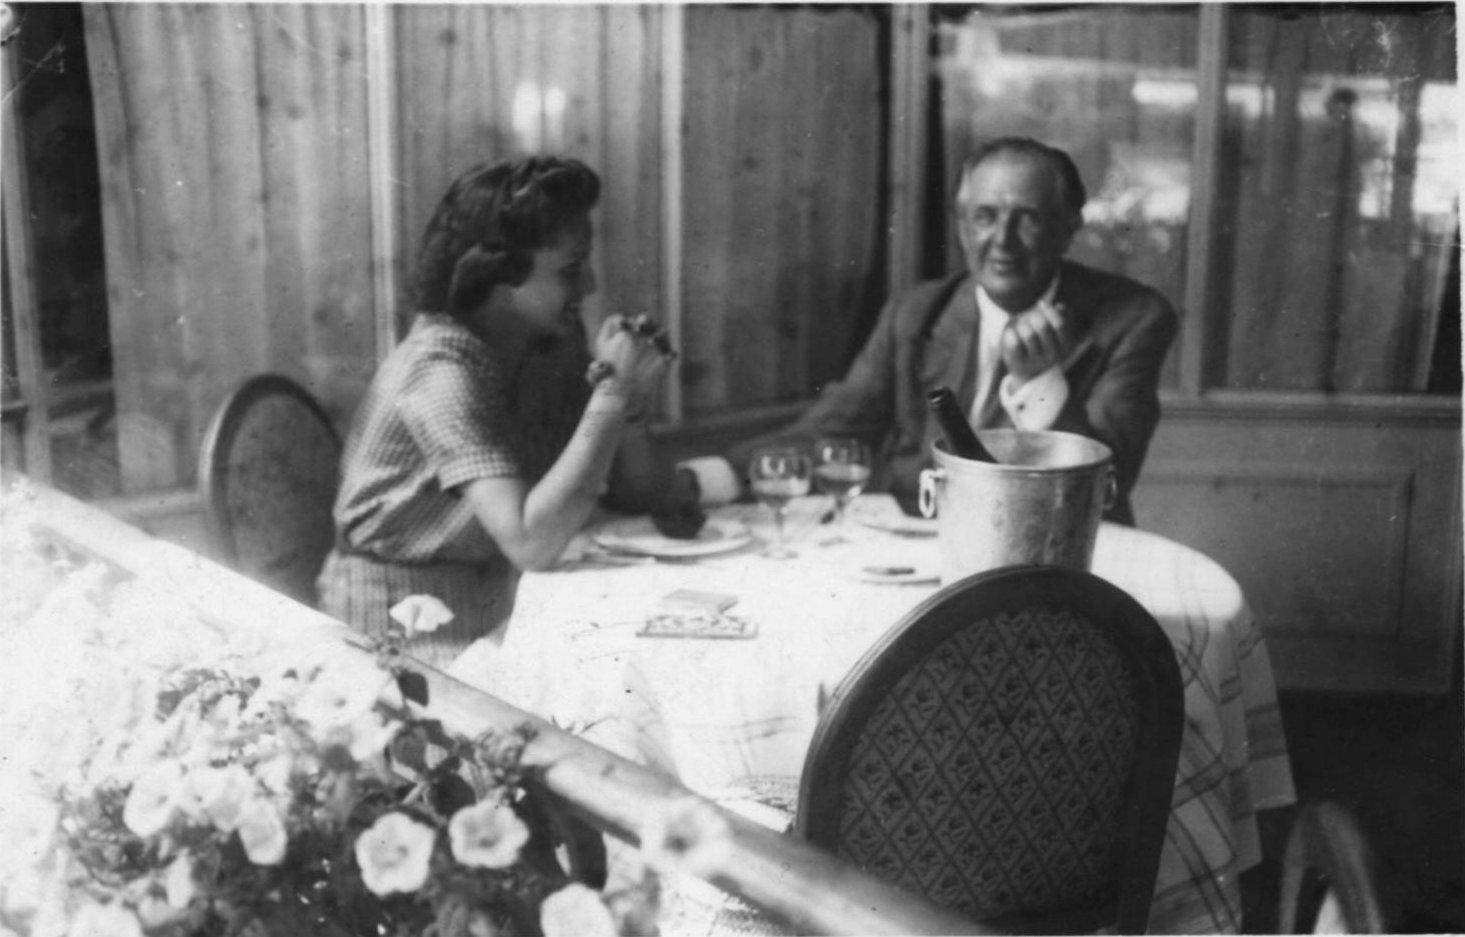 1943. Н.П.Рябушинский с девушкой в ресторане. 28 мая. Париж